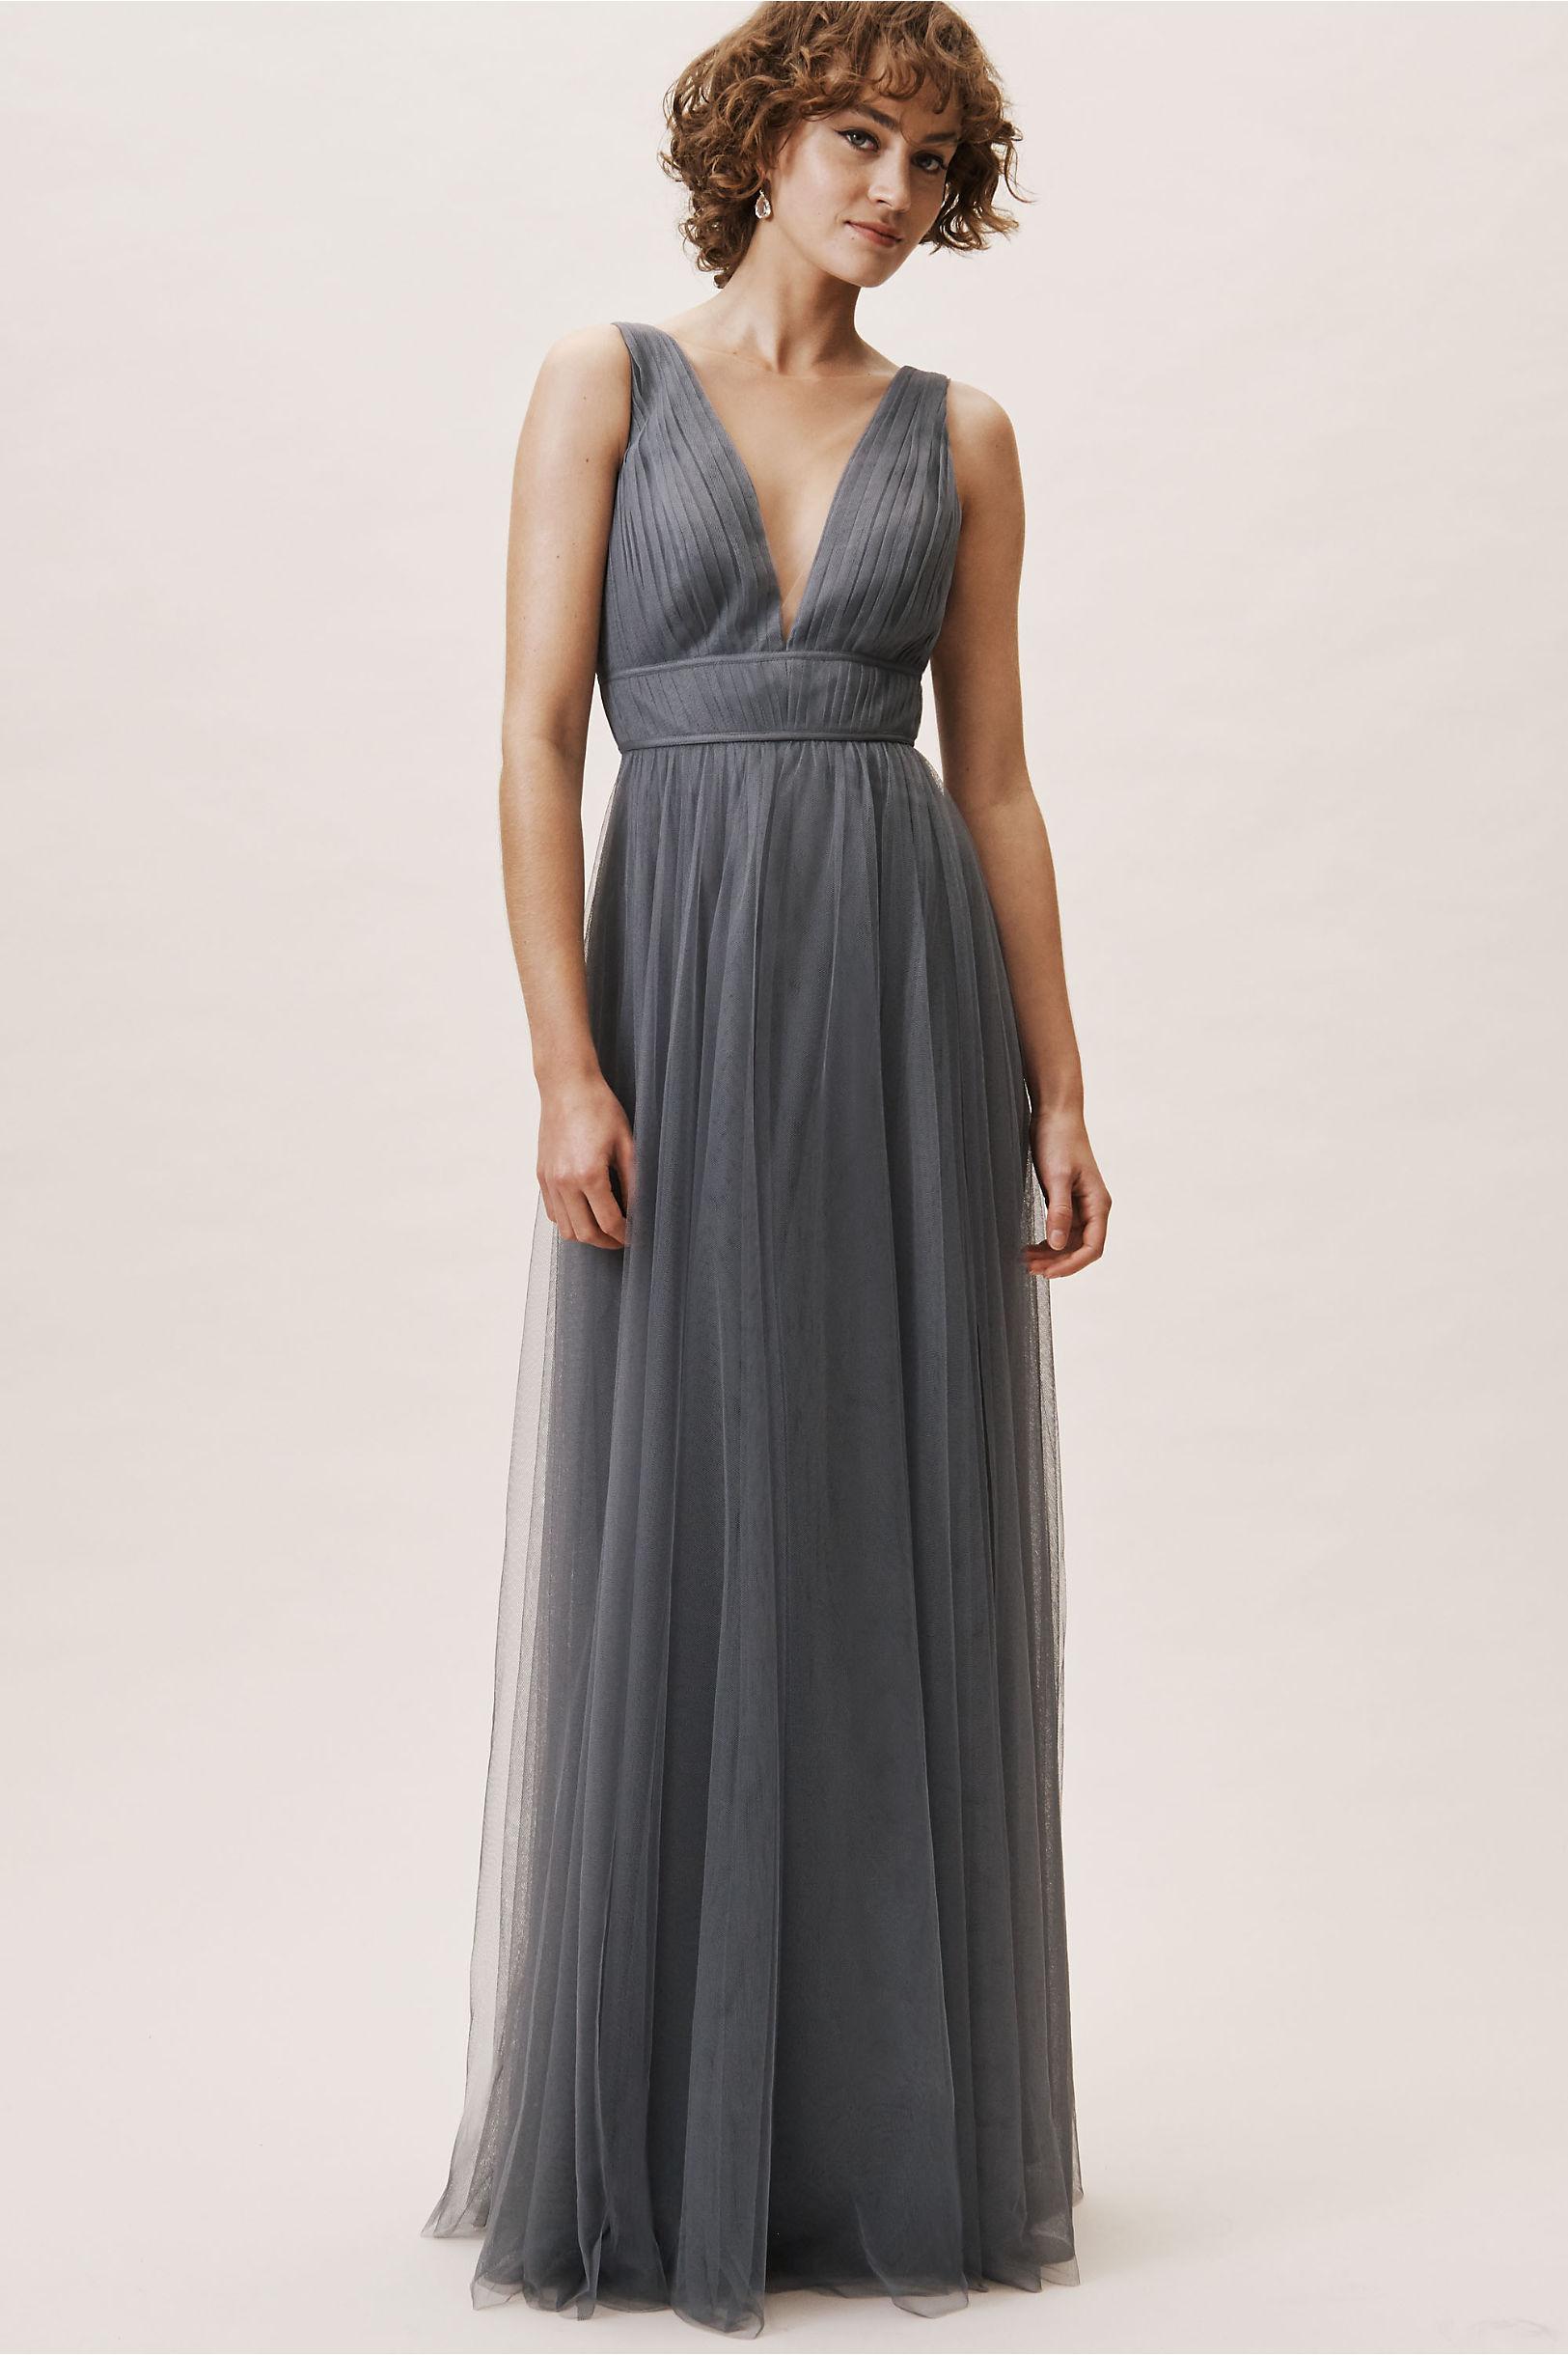 bd4ef81a41 Sarita Dress Whipped Apricot in Bridesmaids   Bridal Party